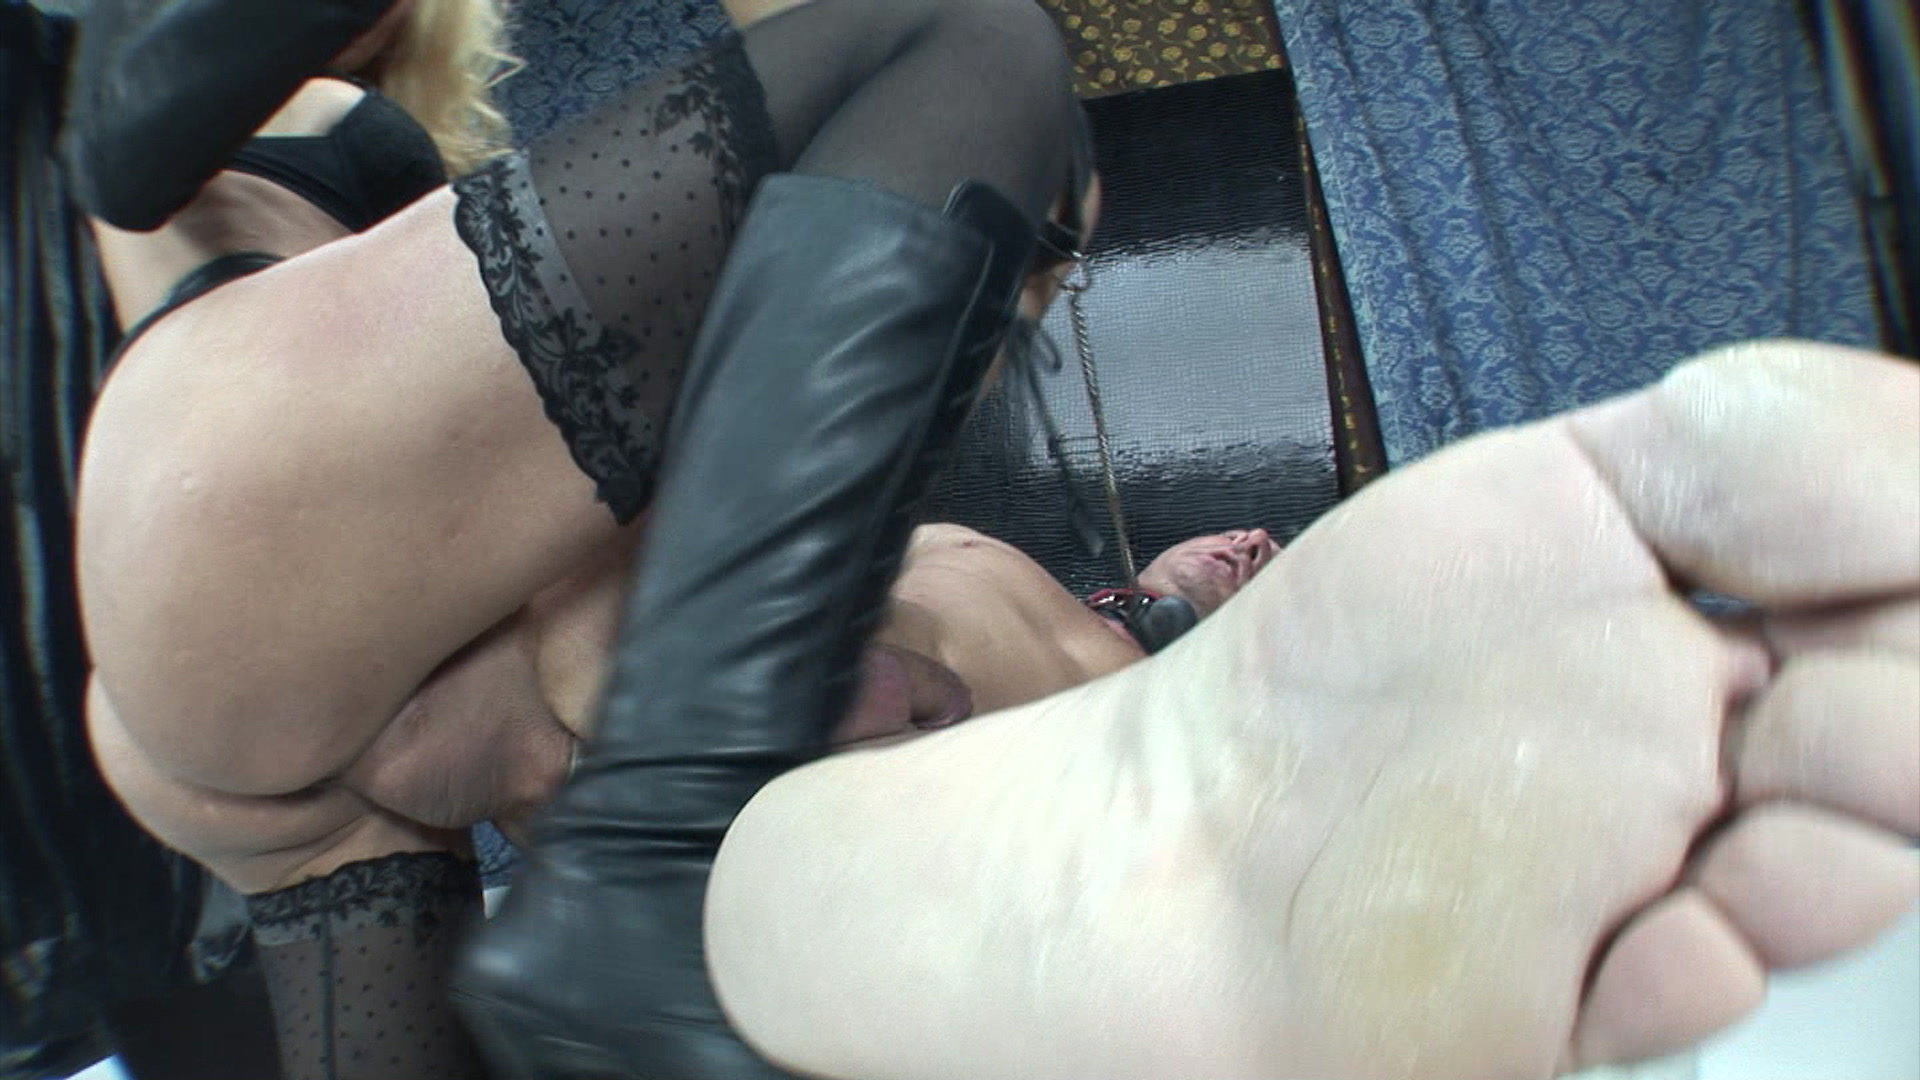 Shemale Prostitute: 3019 videos